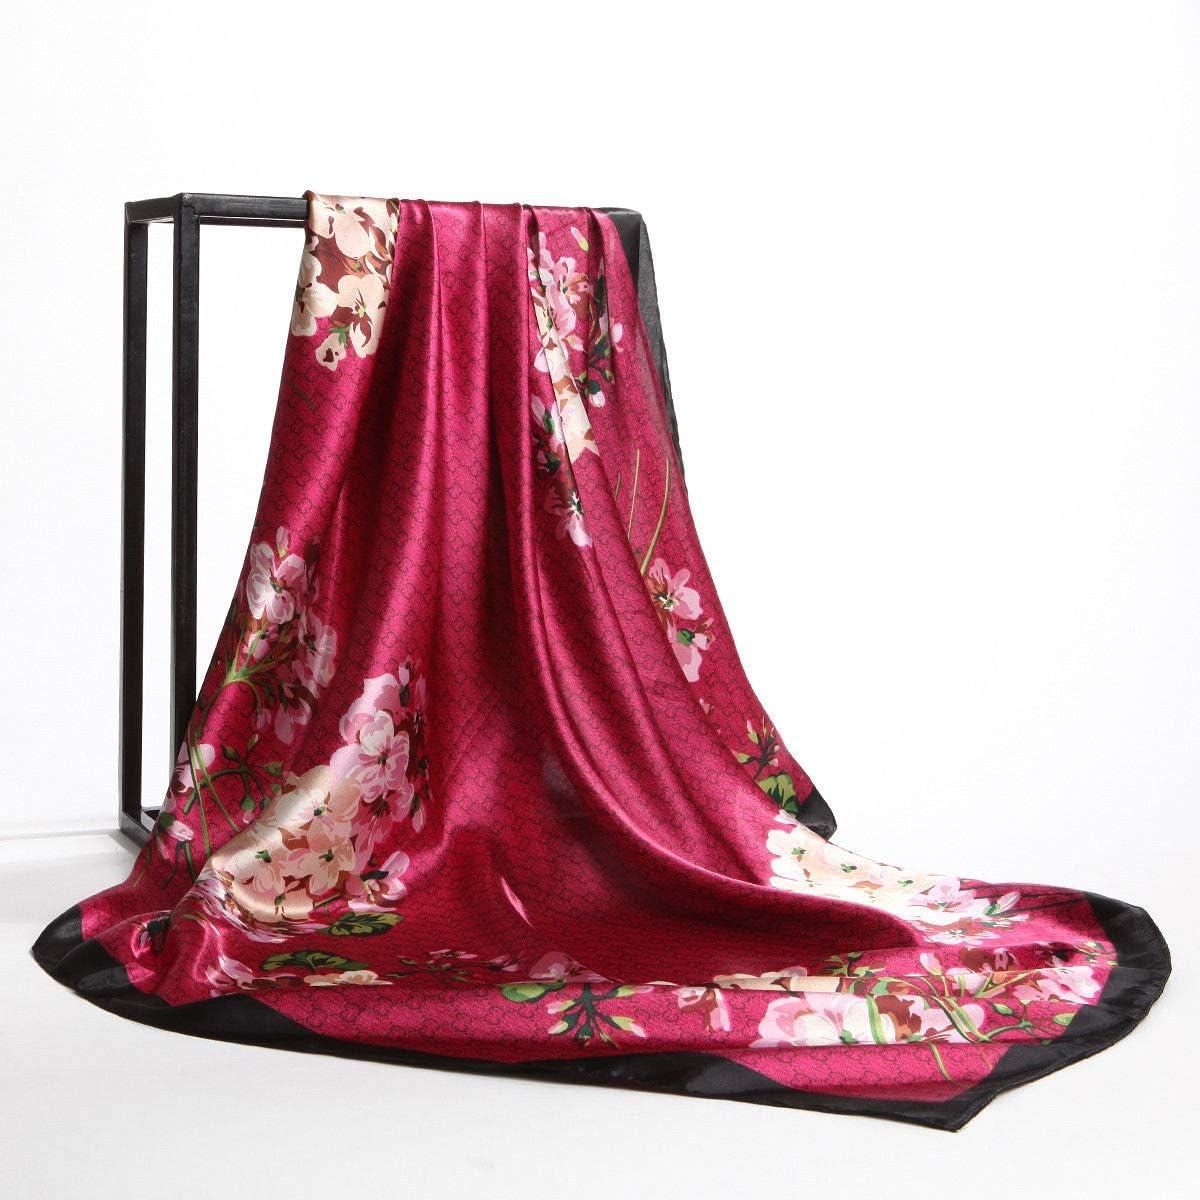 "Women/'s Fashion Purple Hijab Scarf Floral Print Square Polyester Scarves 35/""*35/"""